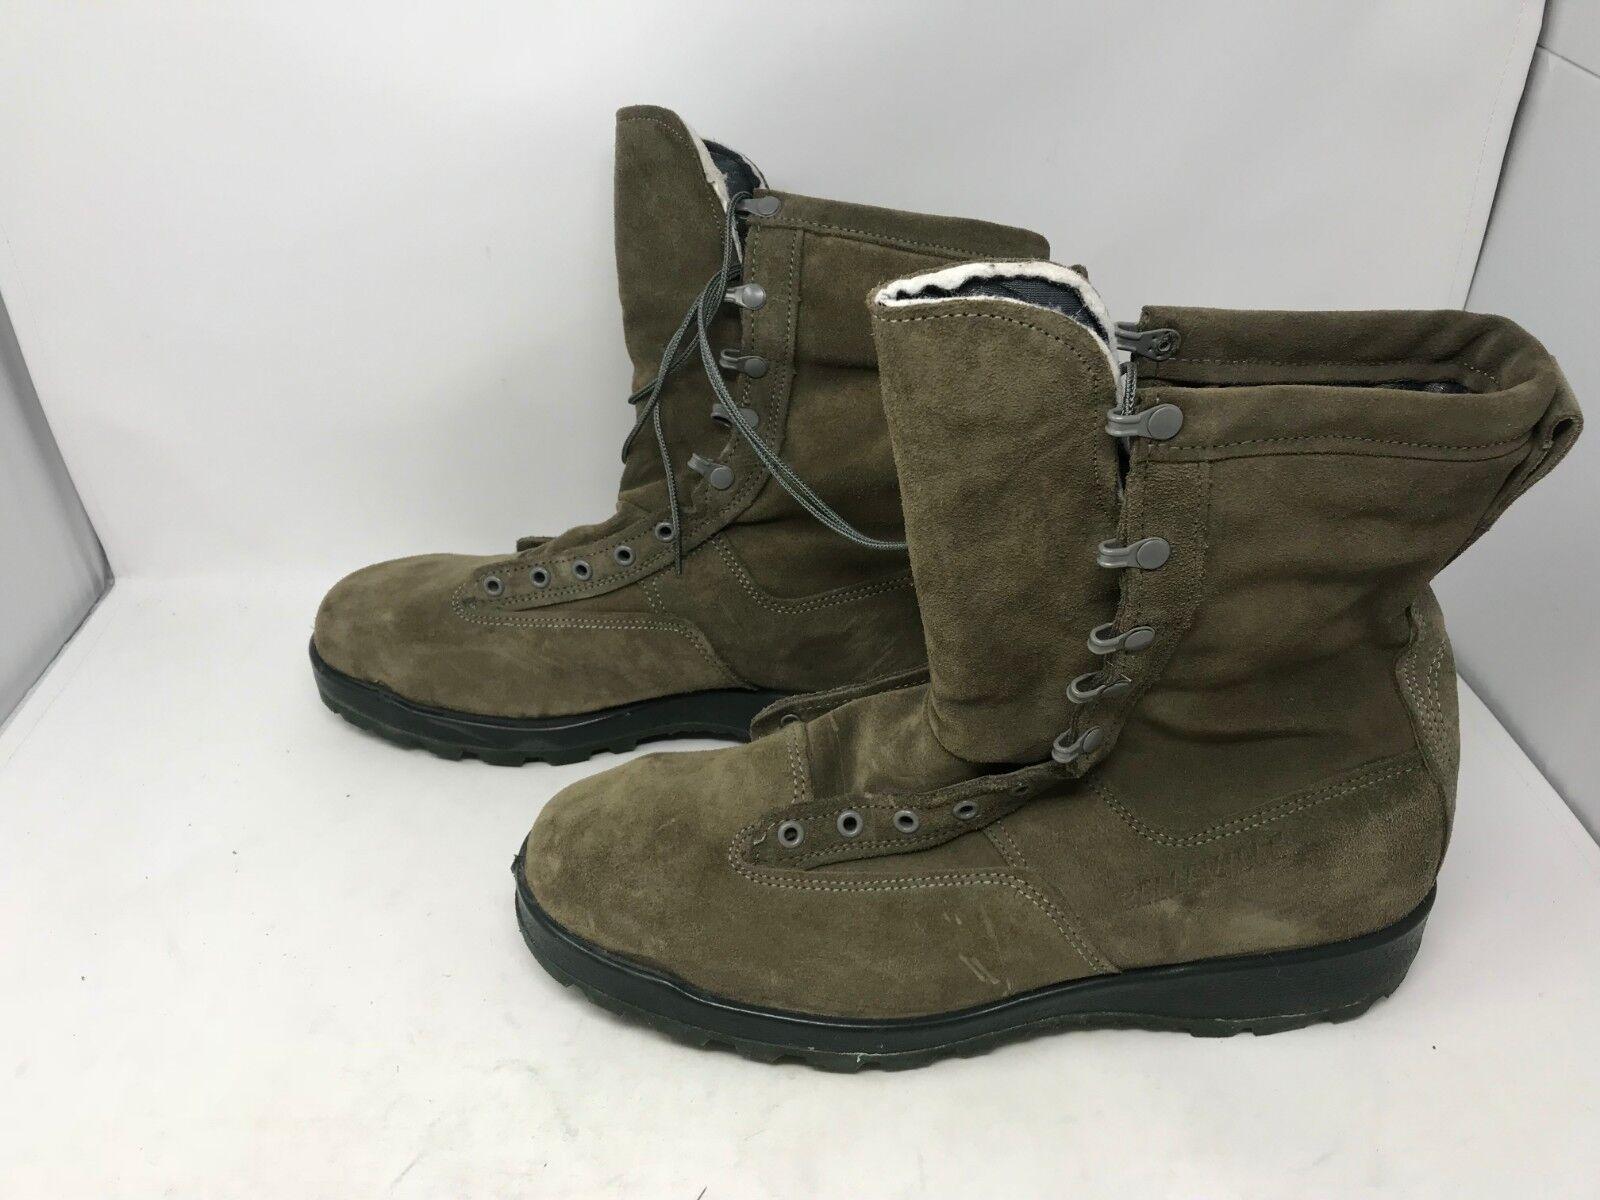 Mens (675ST) Belleville (675ST) Mens Wides Waterproof Steel Toe Boots (2M) 0e1bb0